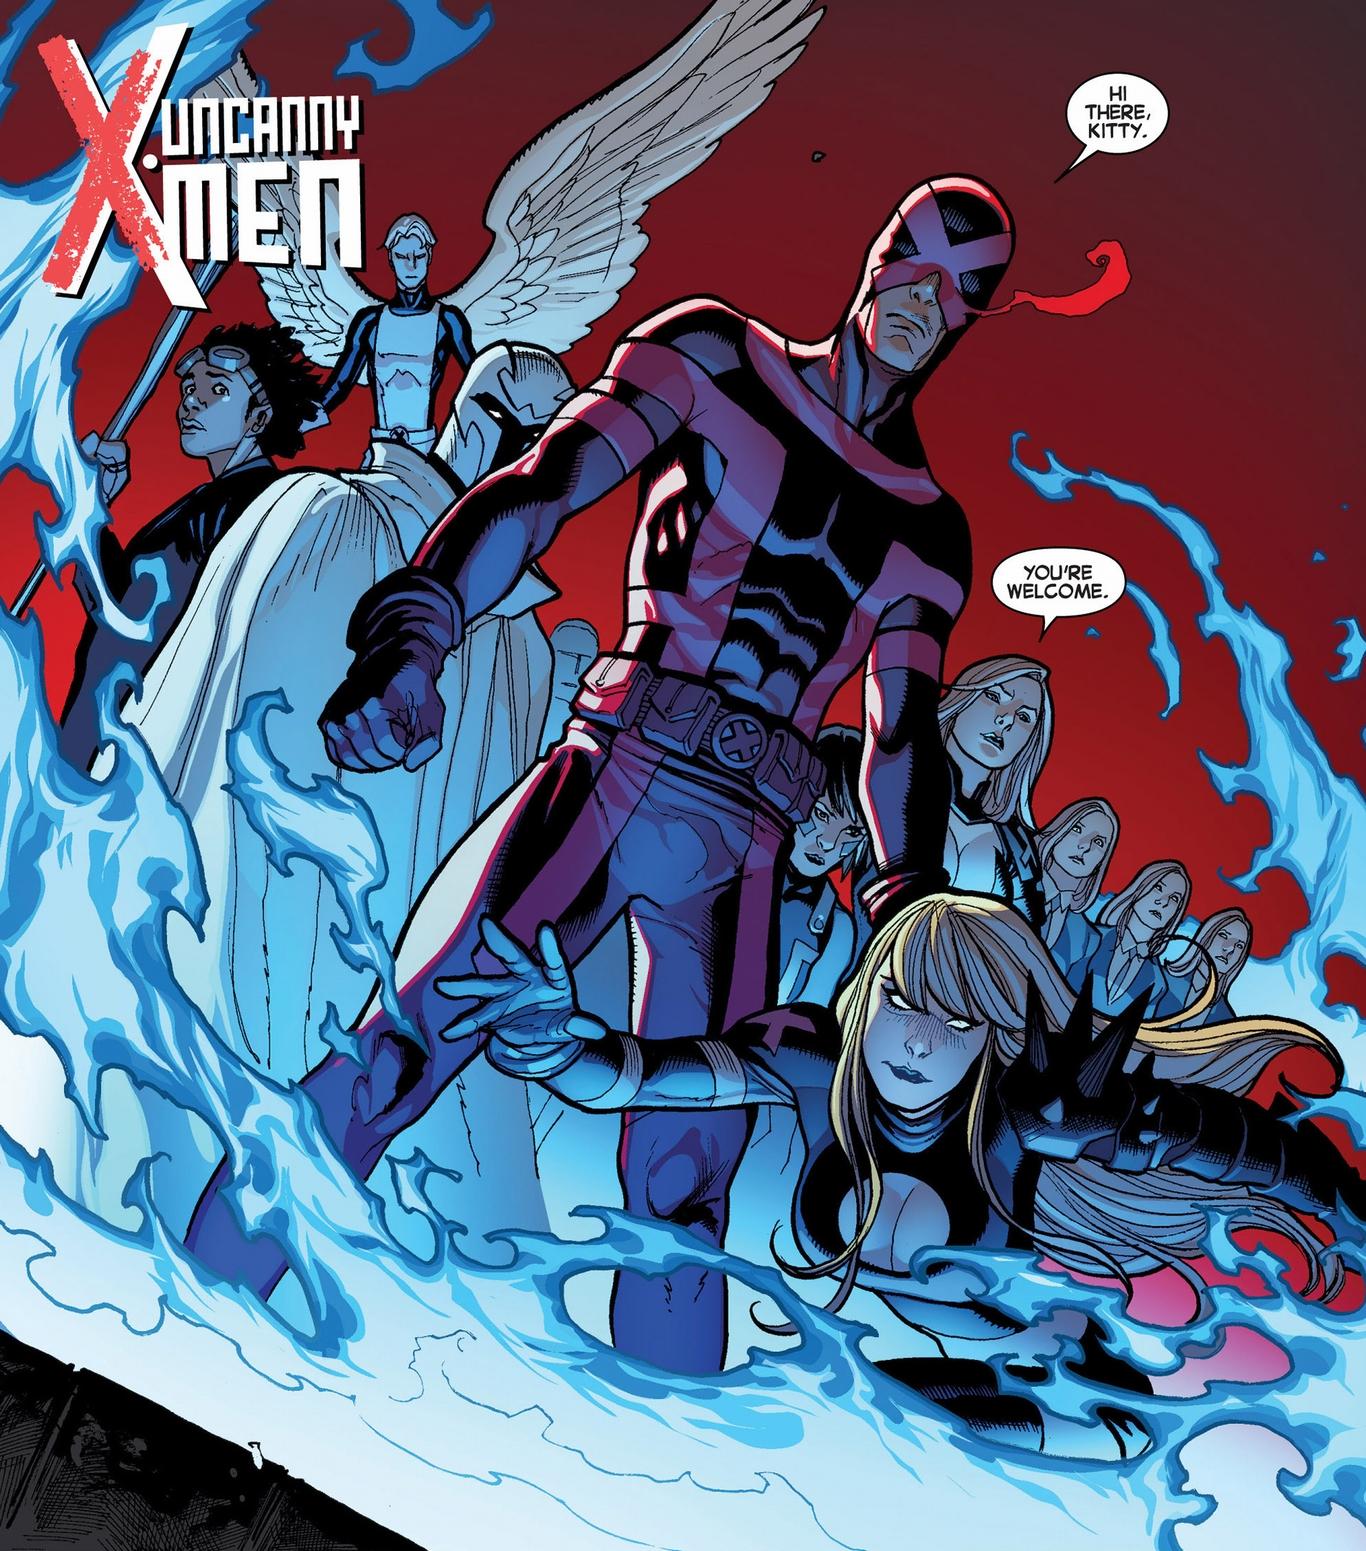 X-Men (Extinction Team) (Earth-616) from X-Men Battle of the Atom Vol 1 1 002.jpg